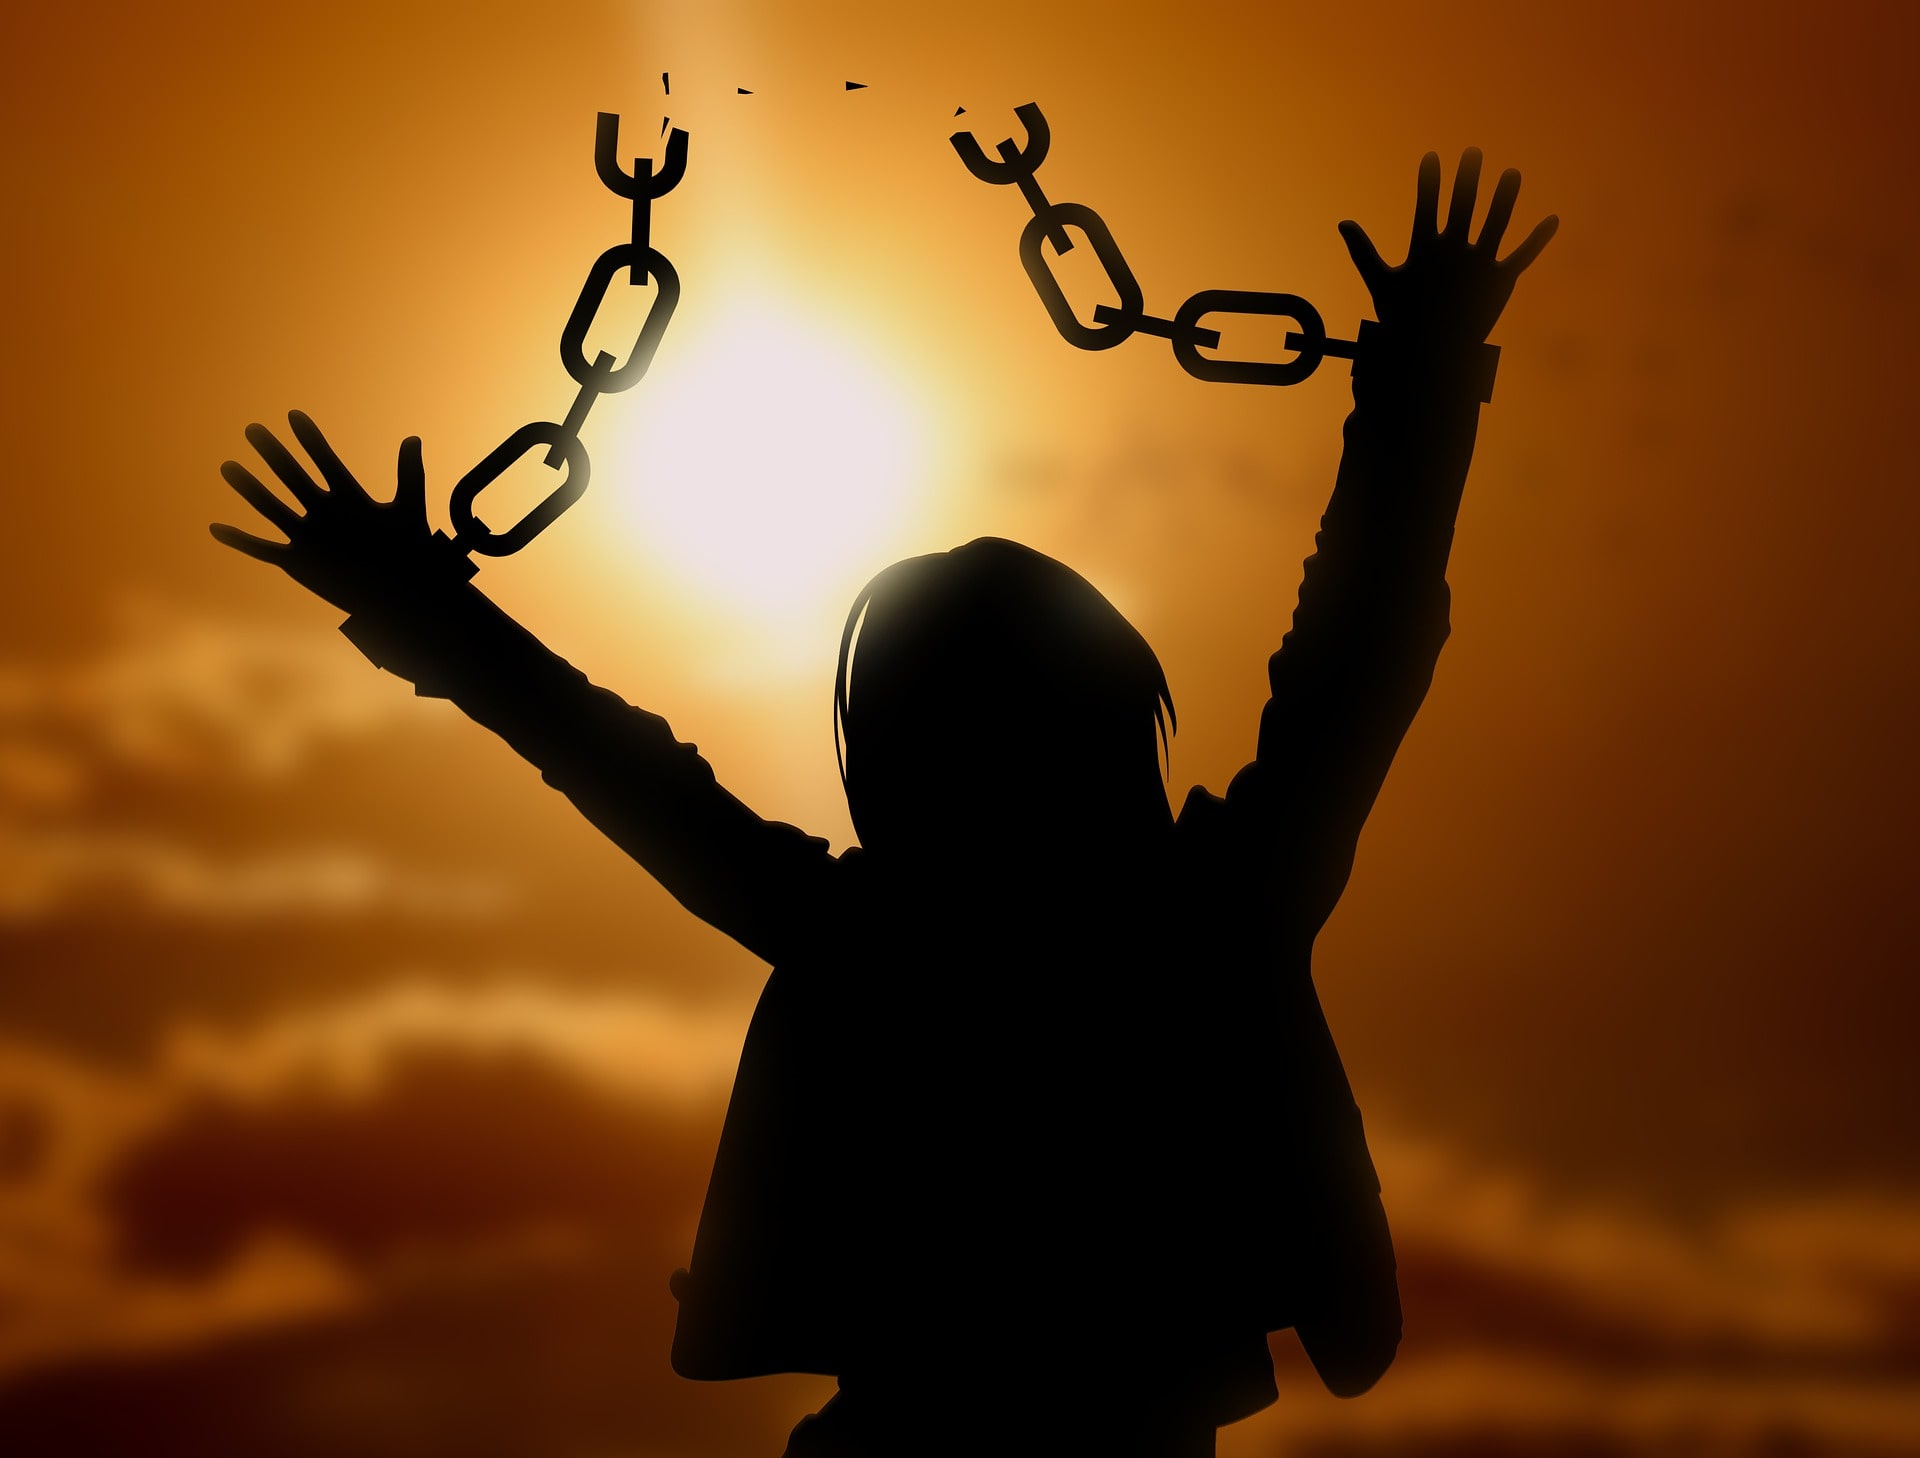 liberté freedom coaching